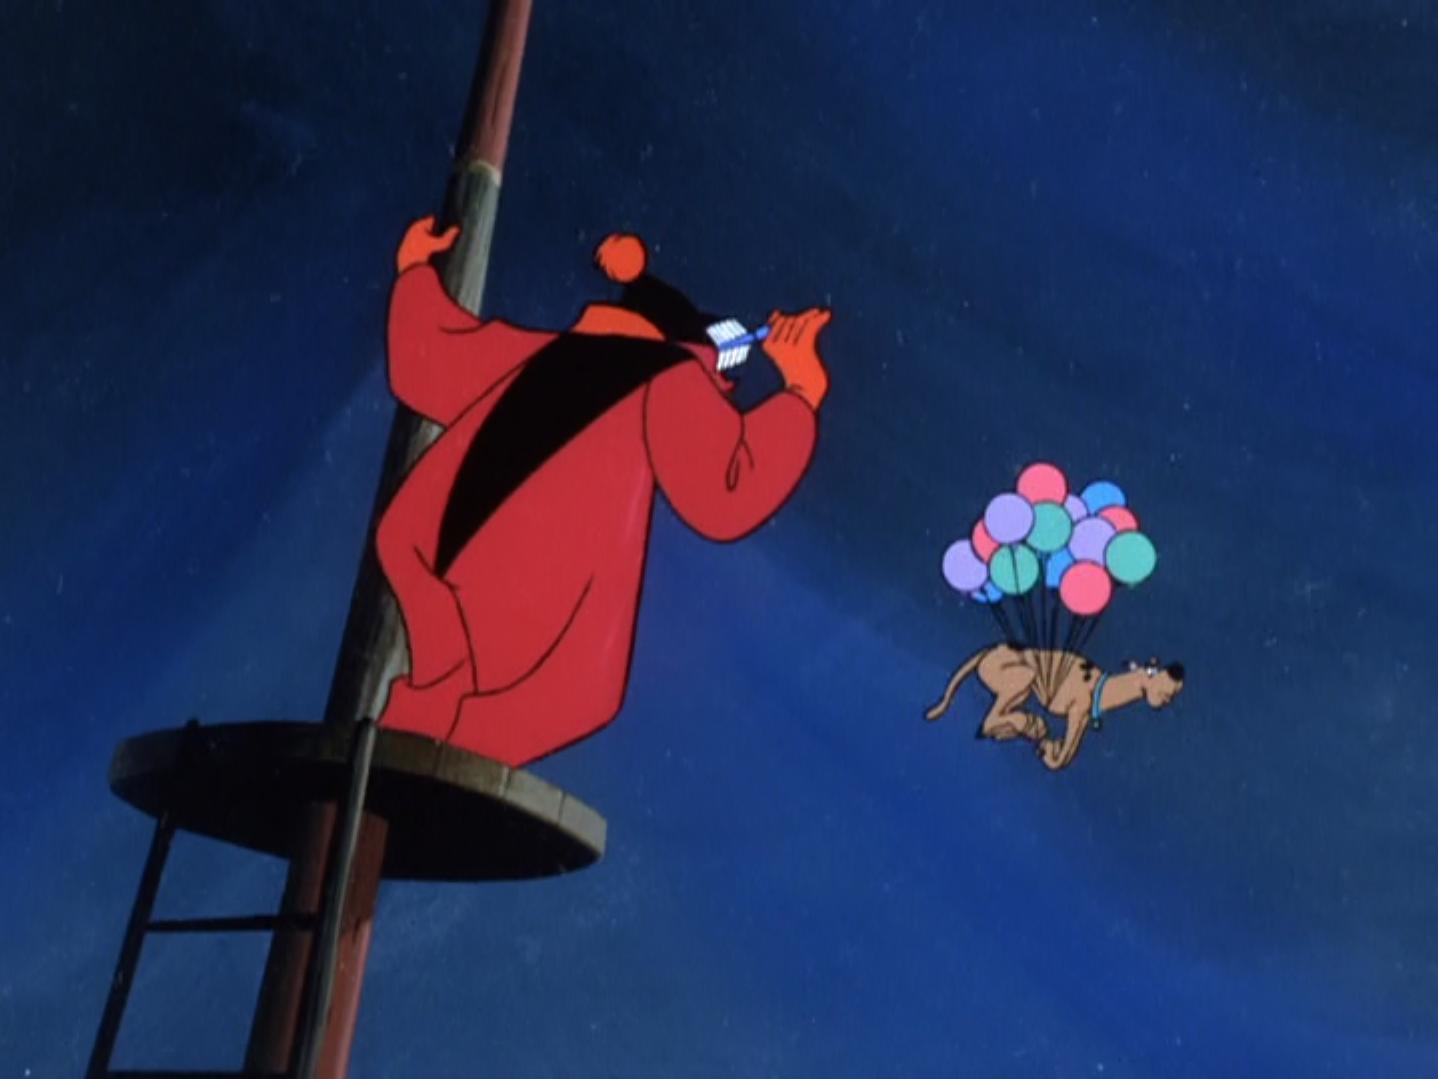 Bedlam in the Big Top | Scoobypedia | FANDOM powered by Wikia